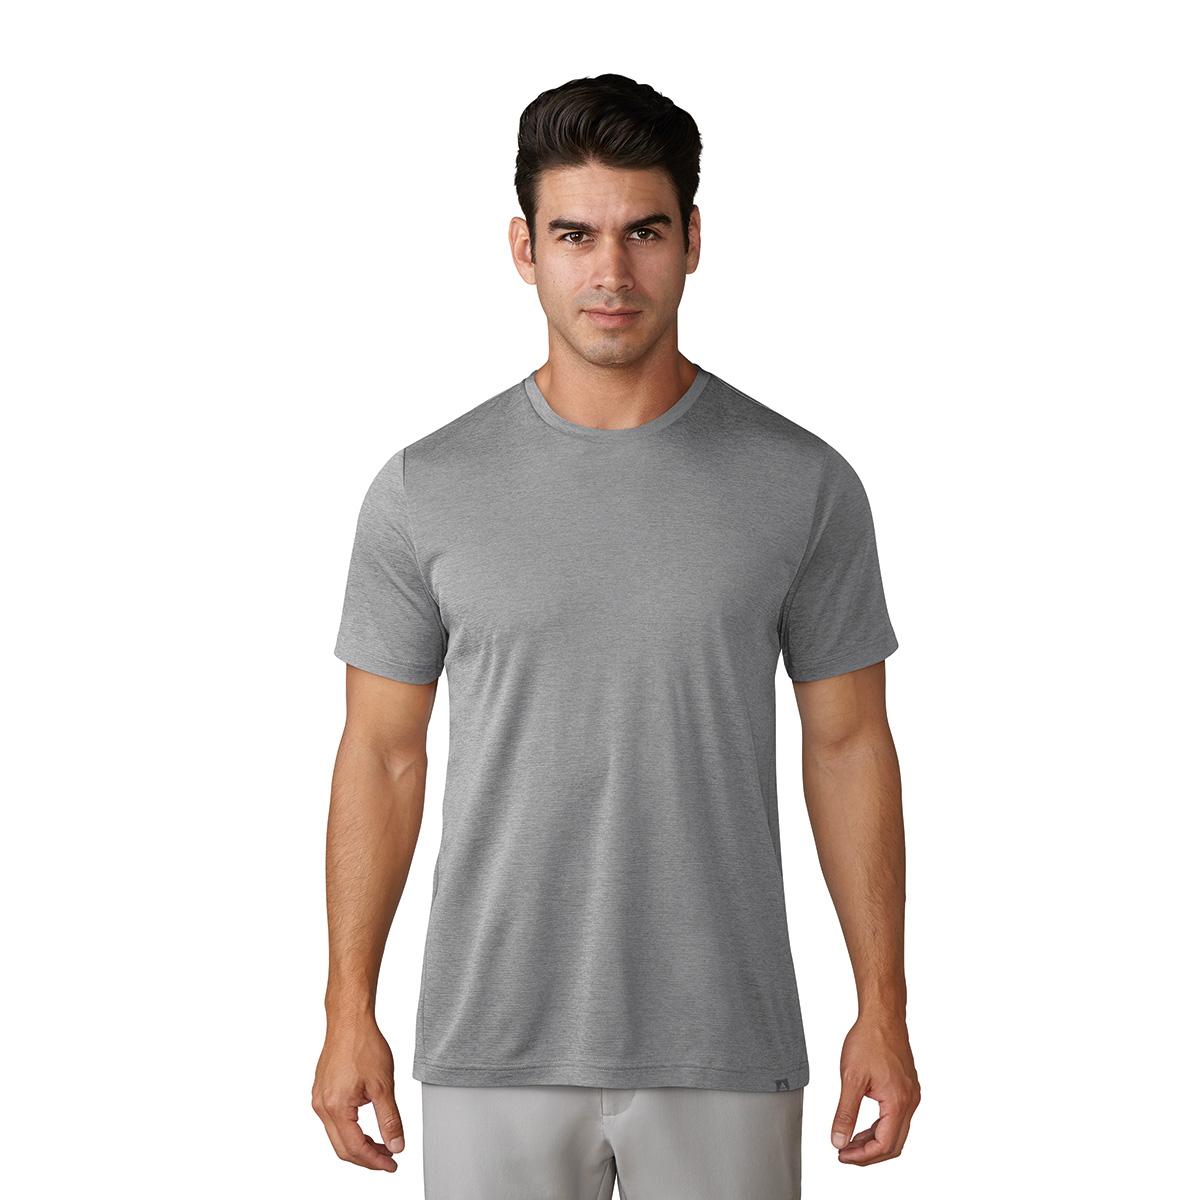 Adidas Men's Adicross No-Show Range T-Shirt